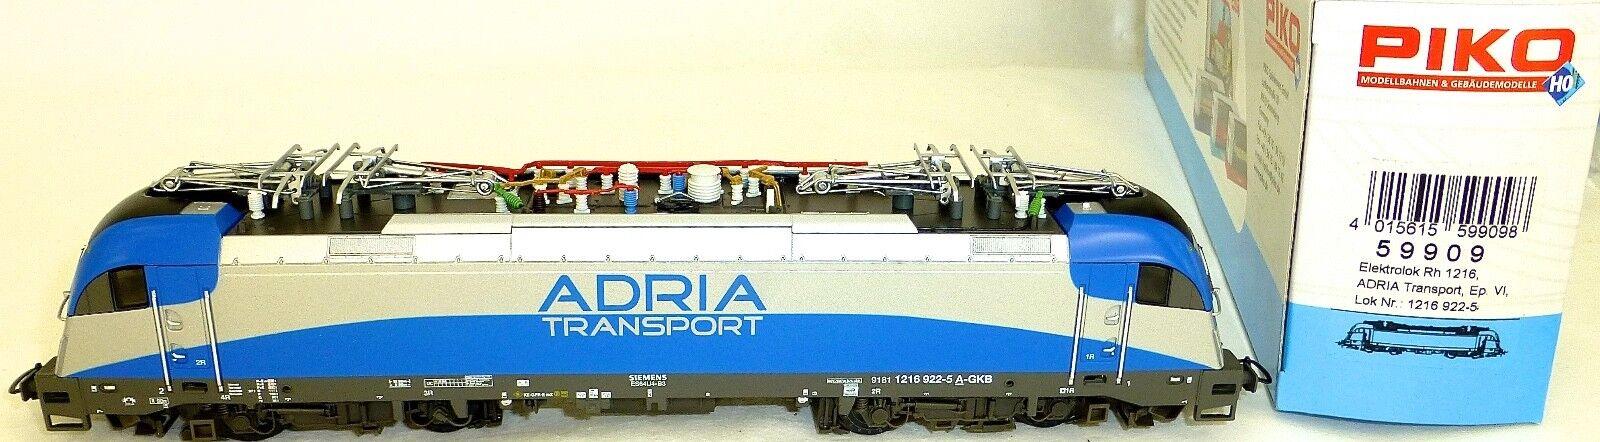 Rh 1216 Ellok Adria Transport Epvi Dss Nem Piko 59909 H0 1:87 Conf. Orig. HI3 Μ